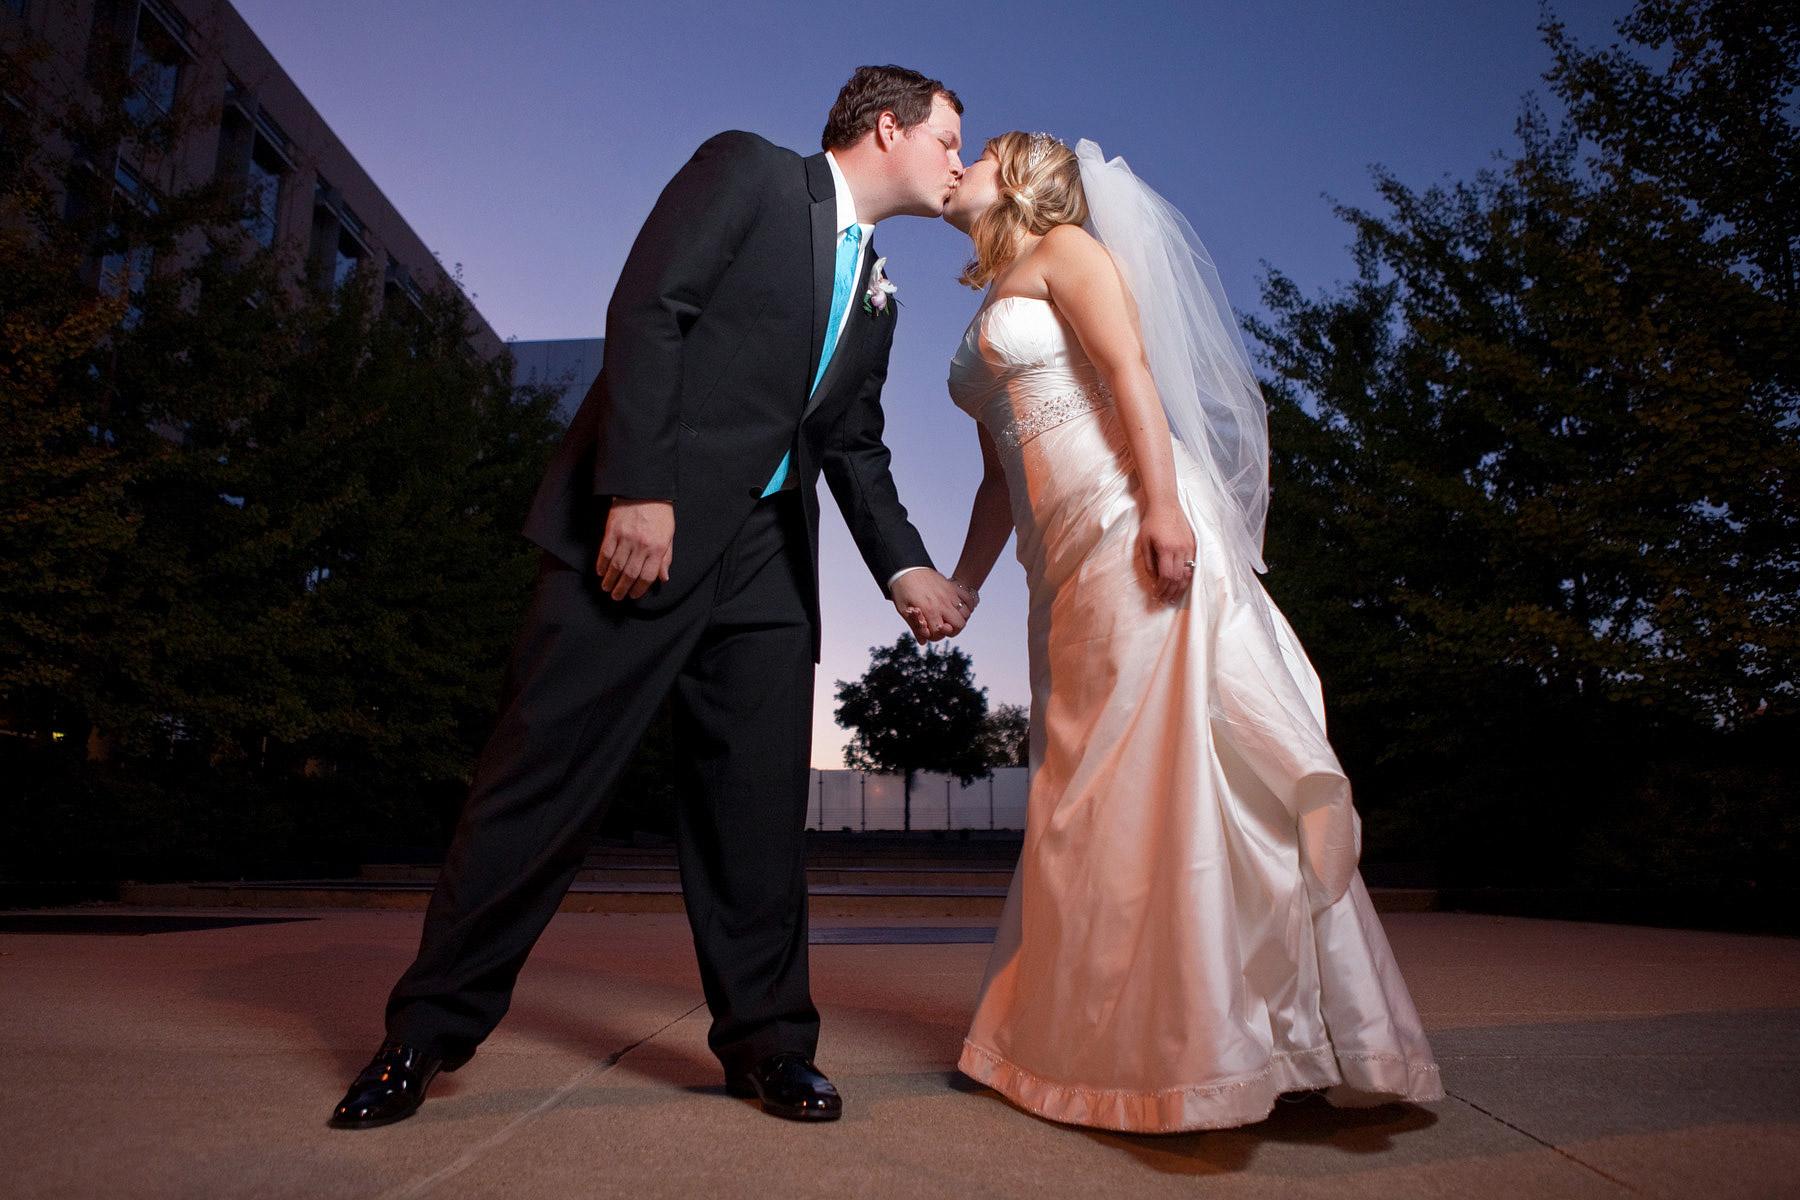 minnesota-wedding-photographers-mark-kegans-914.jpg